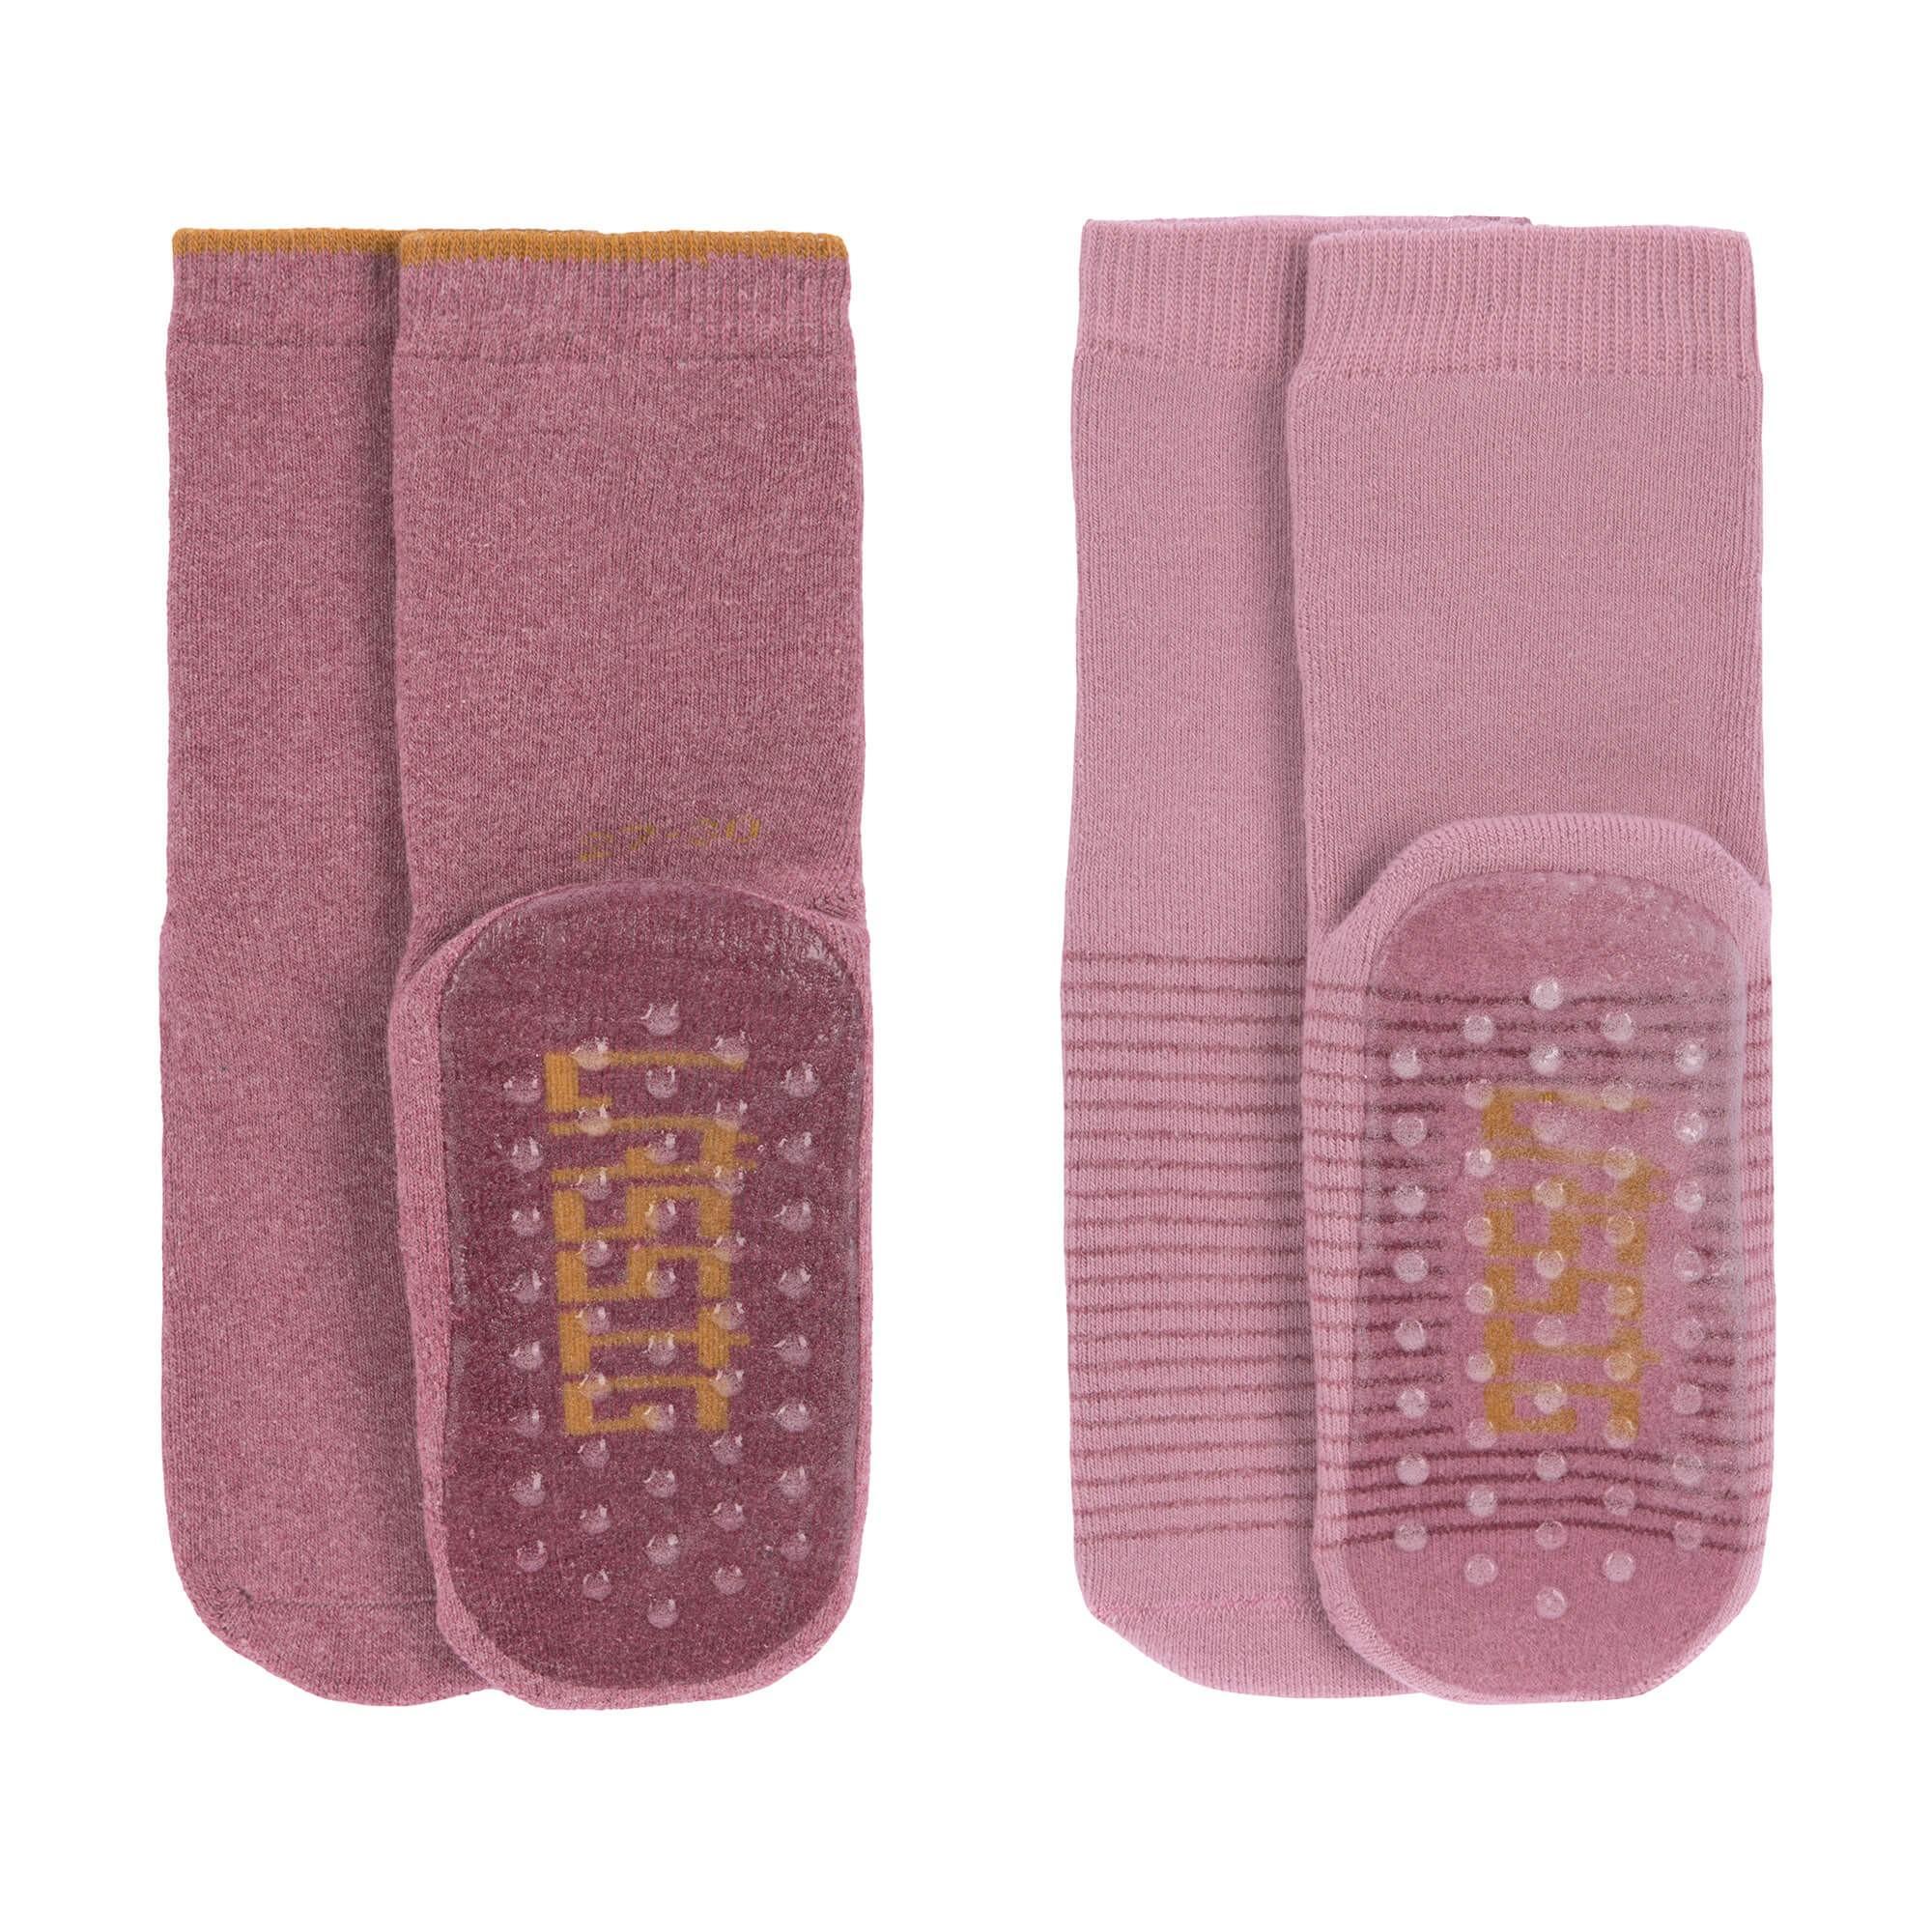 Lassig - Anti-slip Socks 2 pcs. assorted rosewood/rose, Size: 15-18